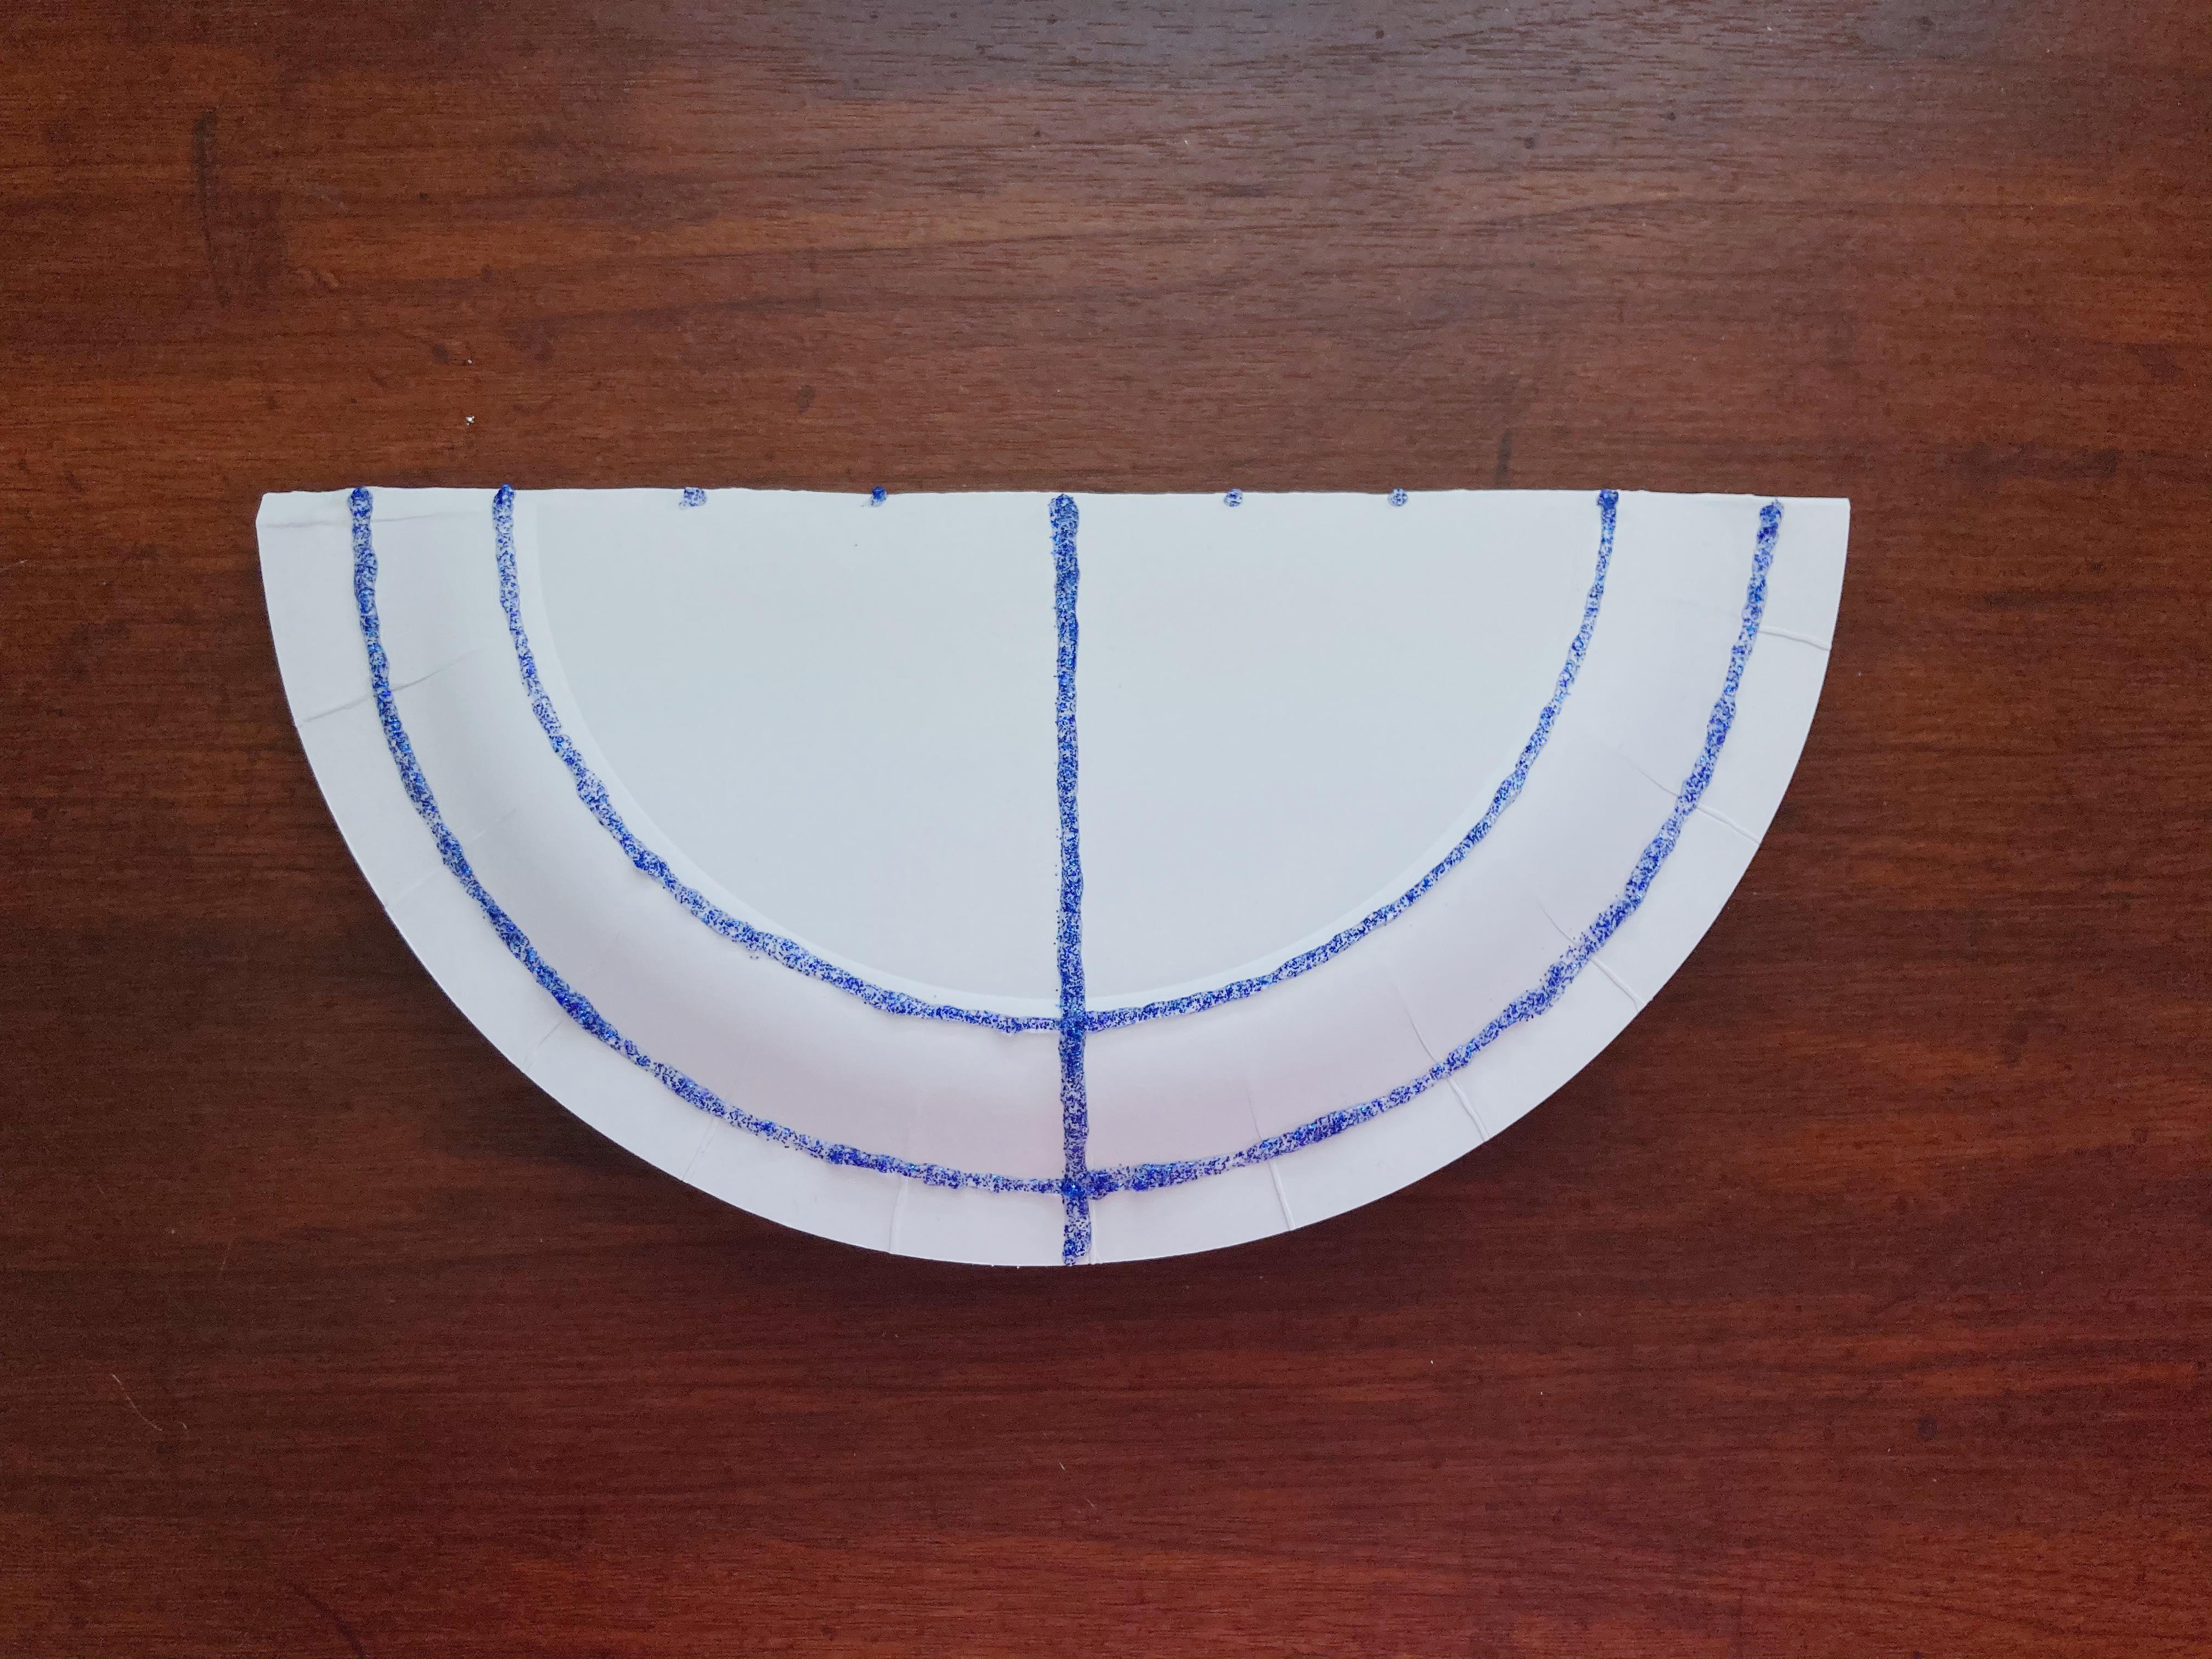 DIY menorah craft from Little Passports step 4